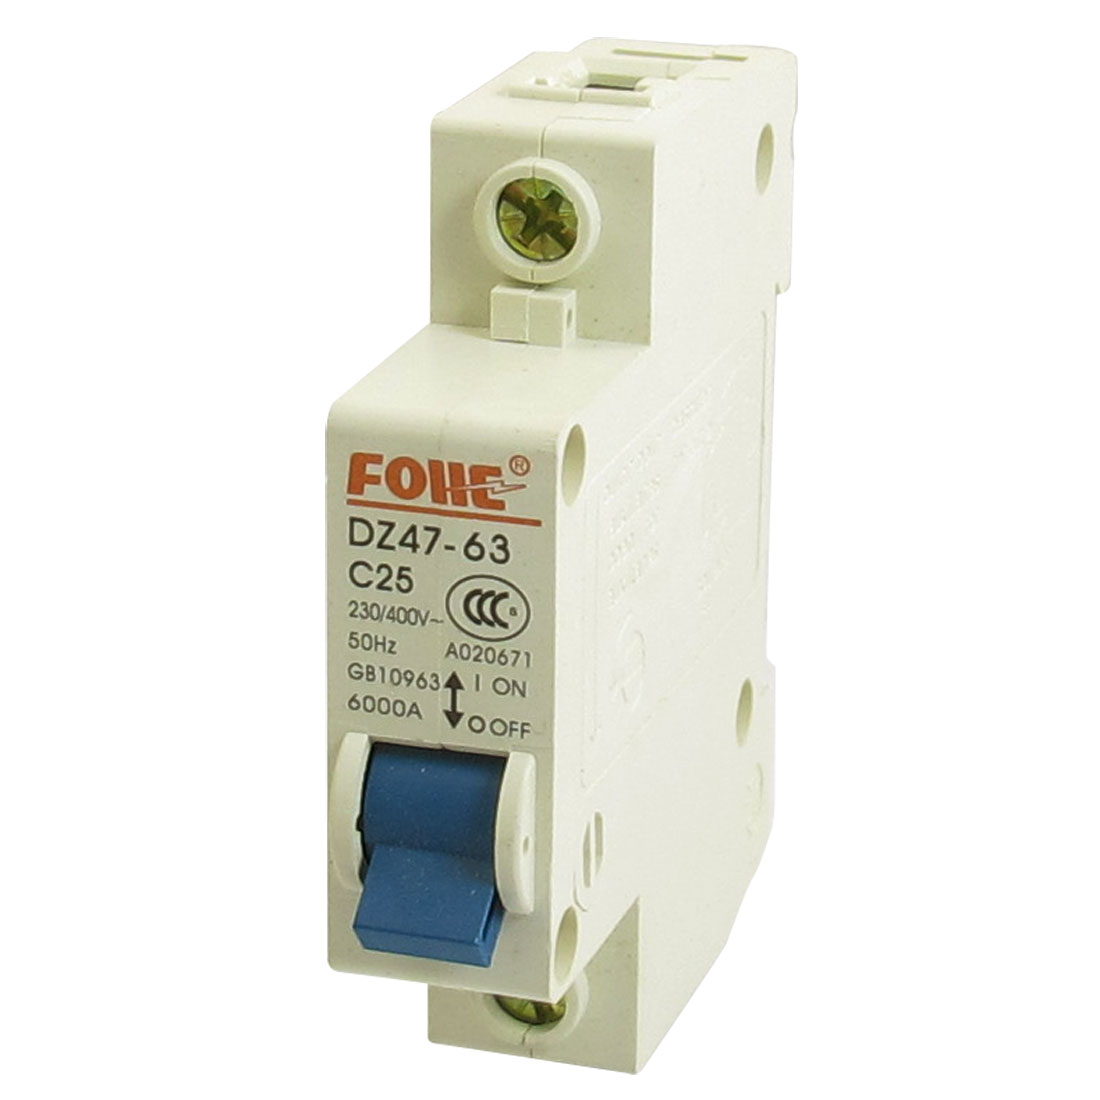 AC 230/400V 25A 6000A 1P 1 Pole Miniature Circuit Breaker DIN Rail DZ47-63 C25